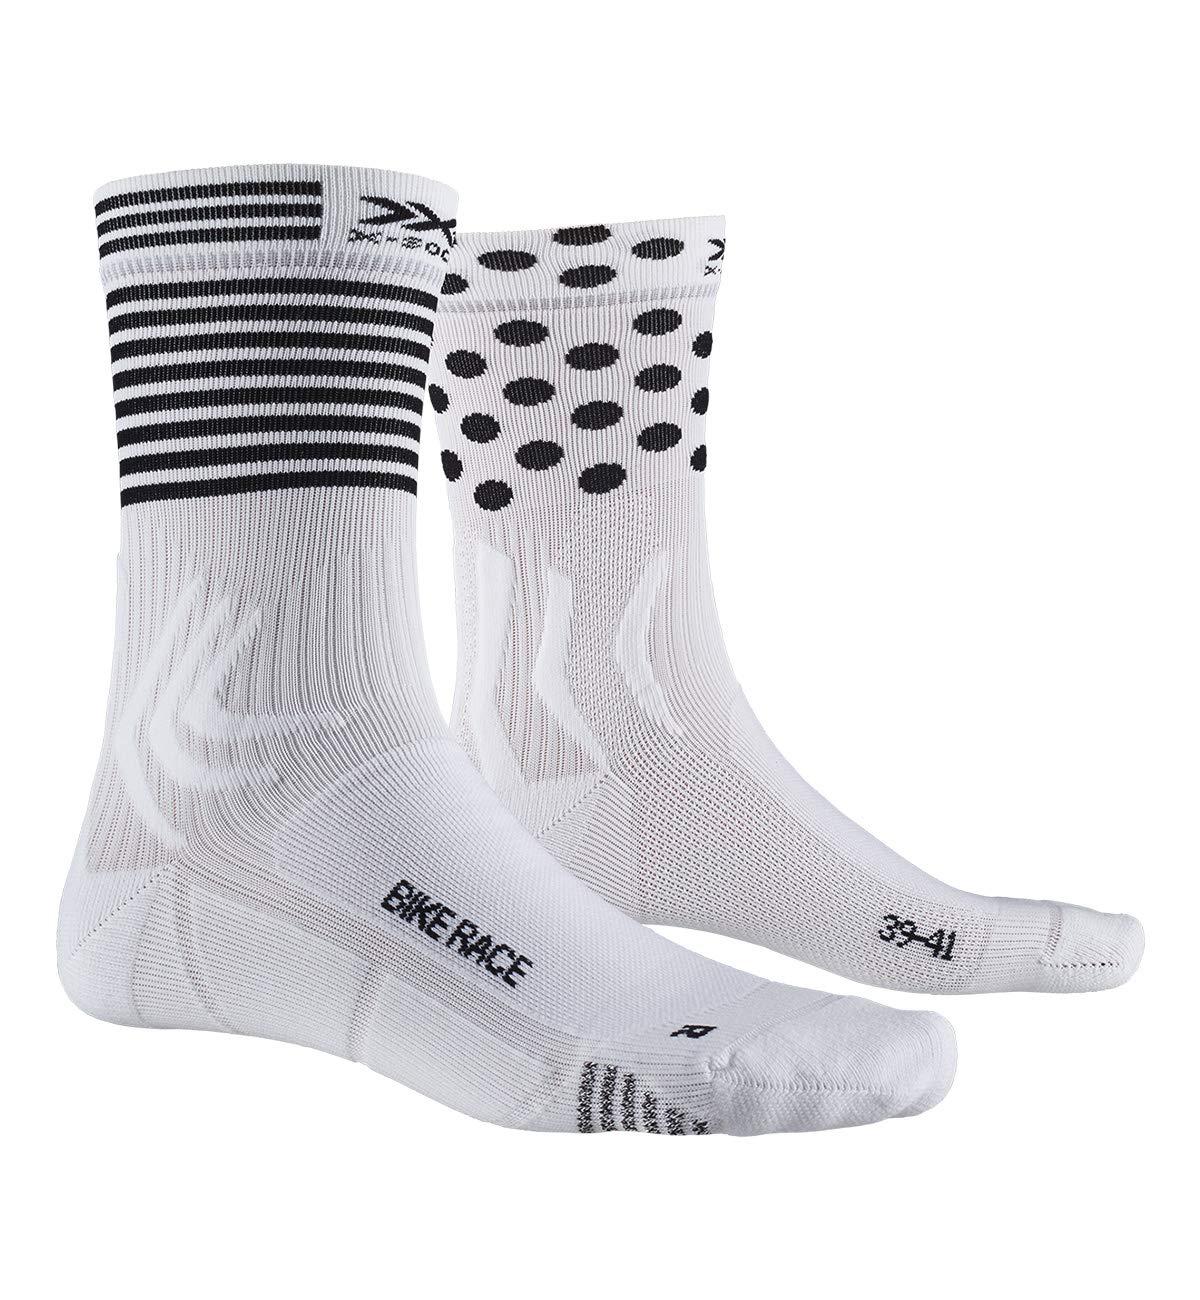 X-Socks Socks Bike Race, Arctic White/Dot/Stripe, 45-47, XS-BS05S19U-W011-45/47